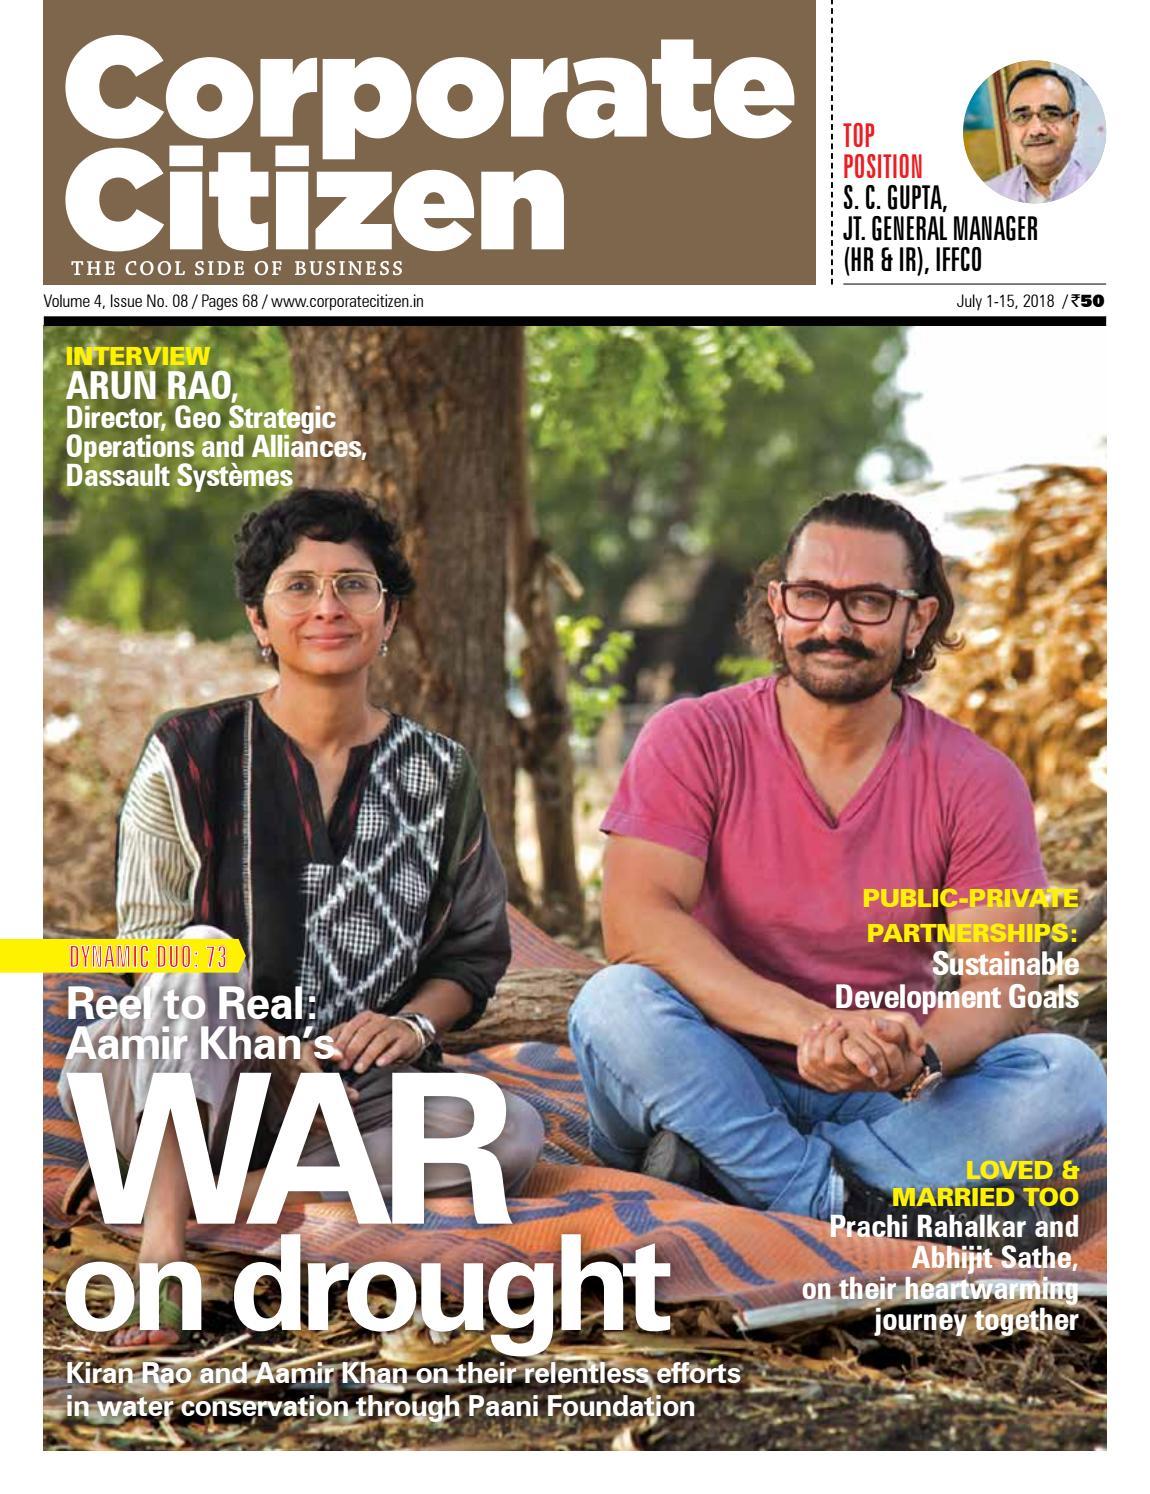 Volume4 issue 8 corporate citizen by Corporate Citizen - issuu